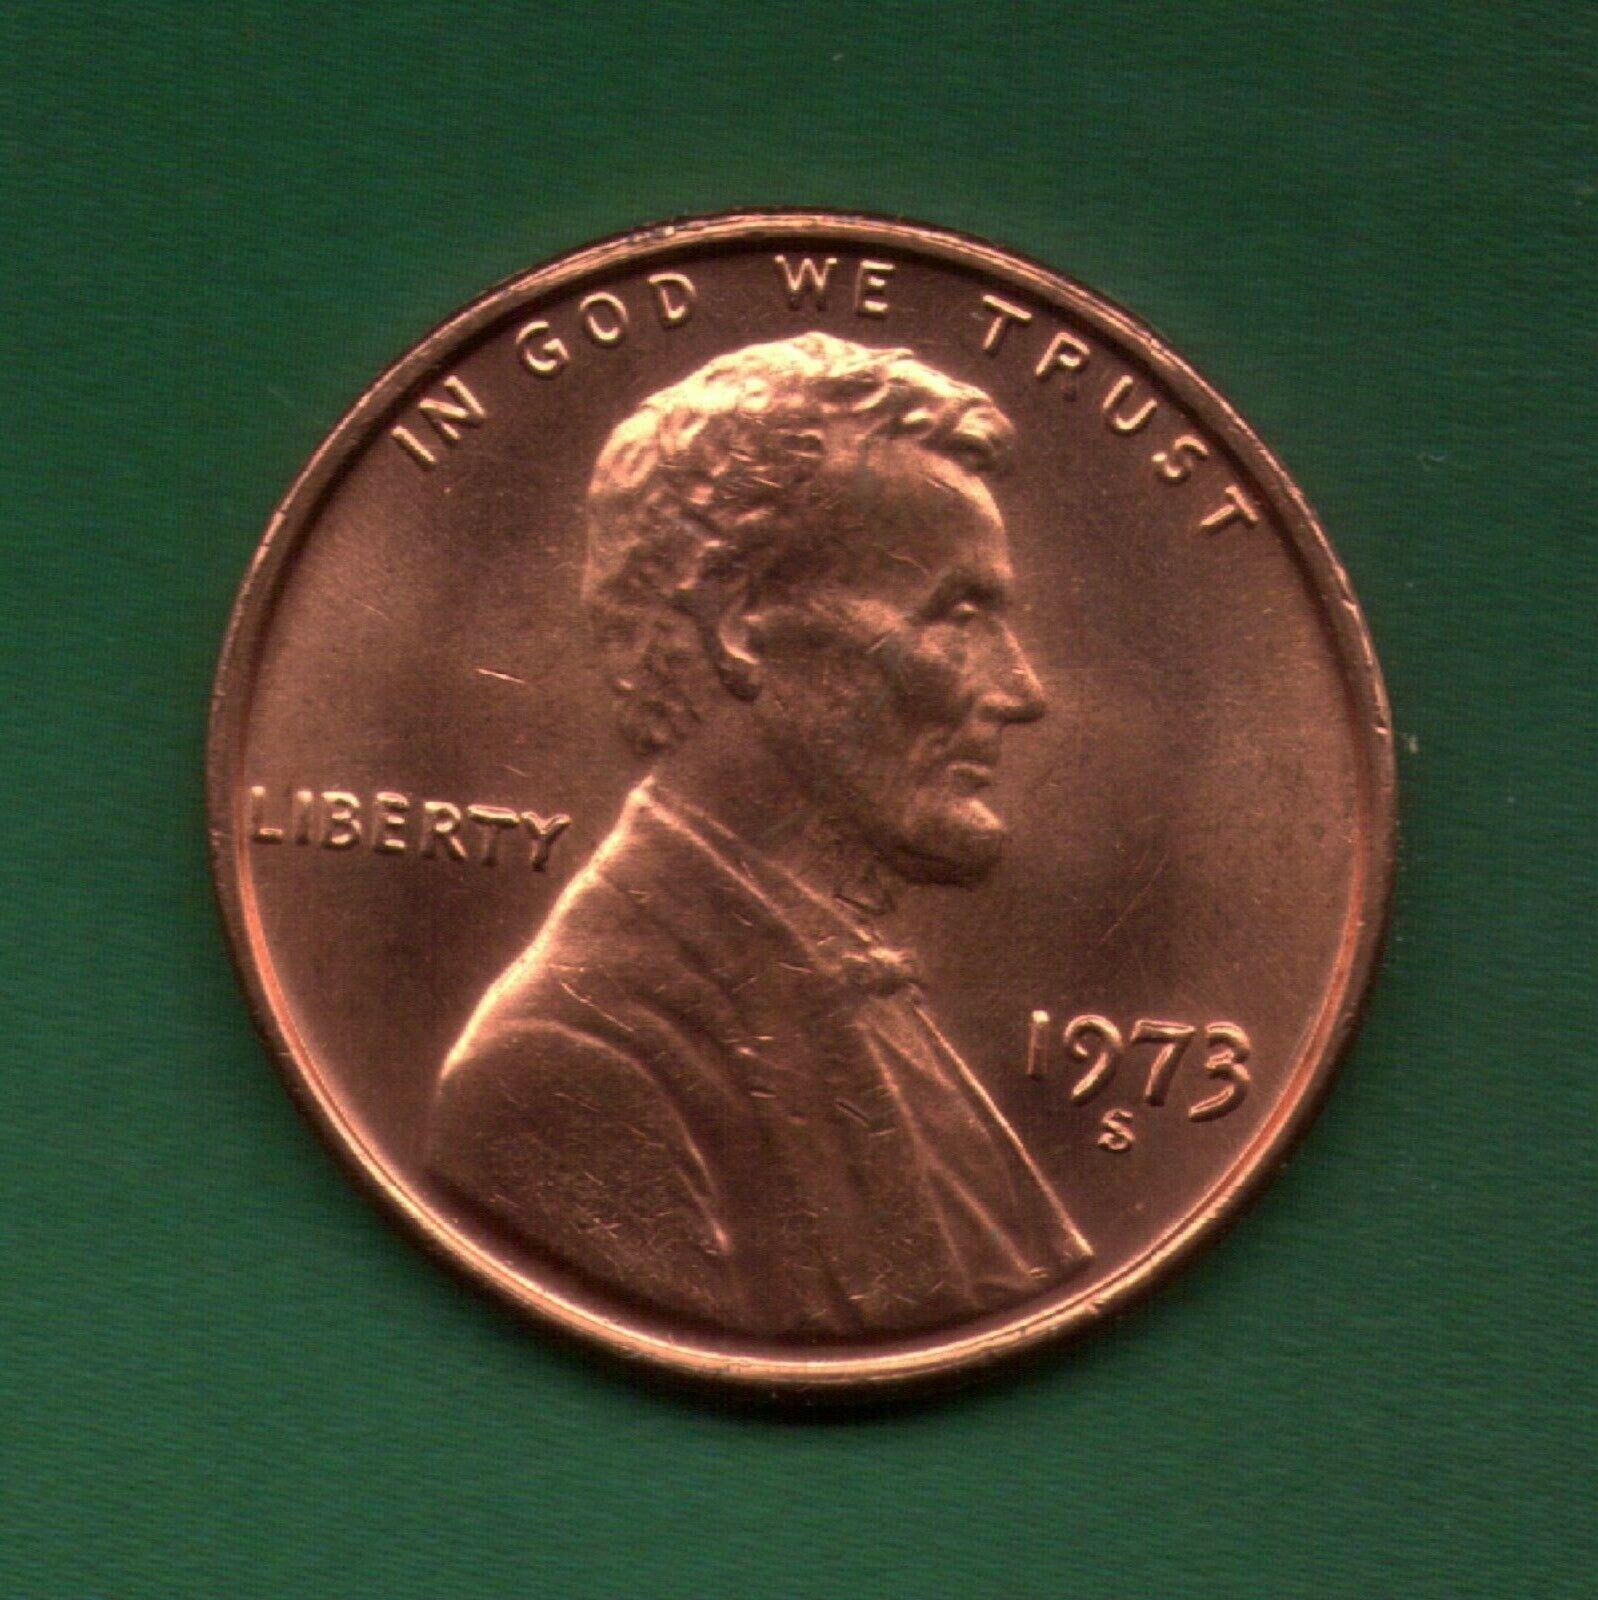 1973 S Penny UNC Slot Filler or Starter Coin   (73S0712) - Image 1